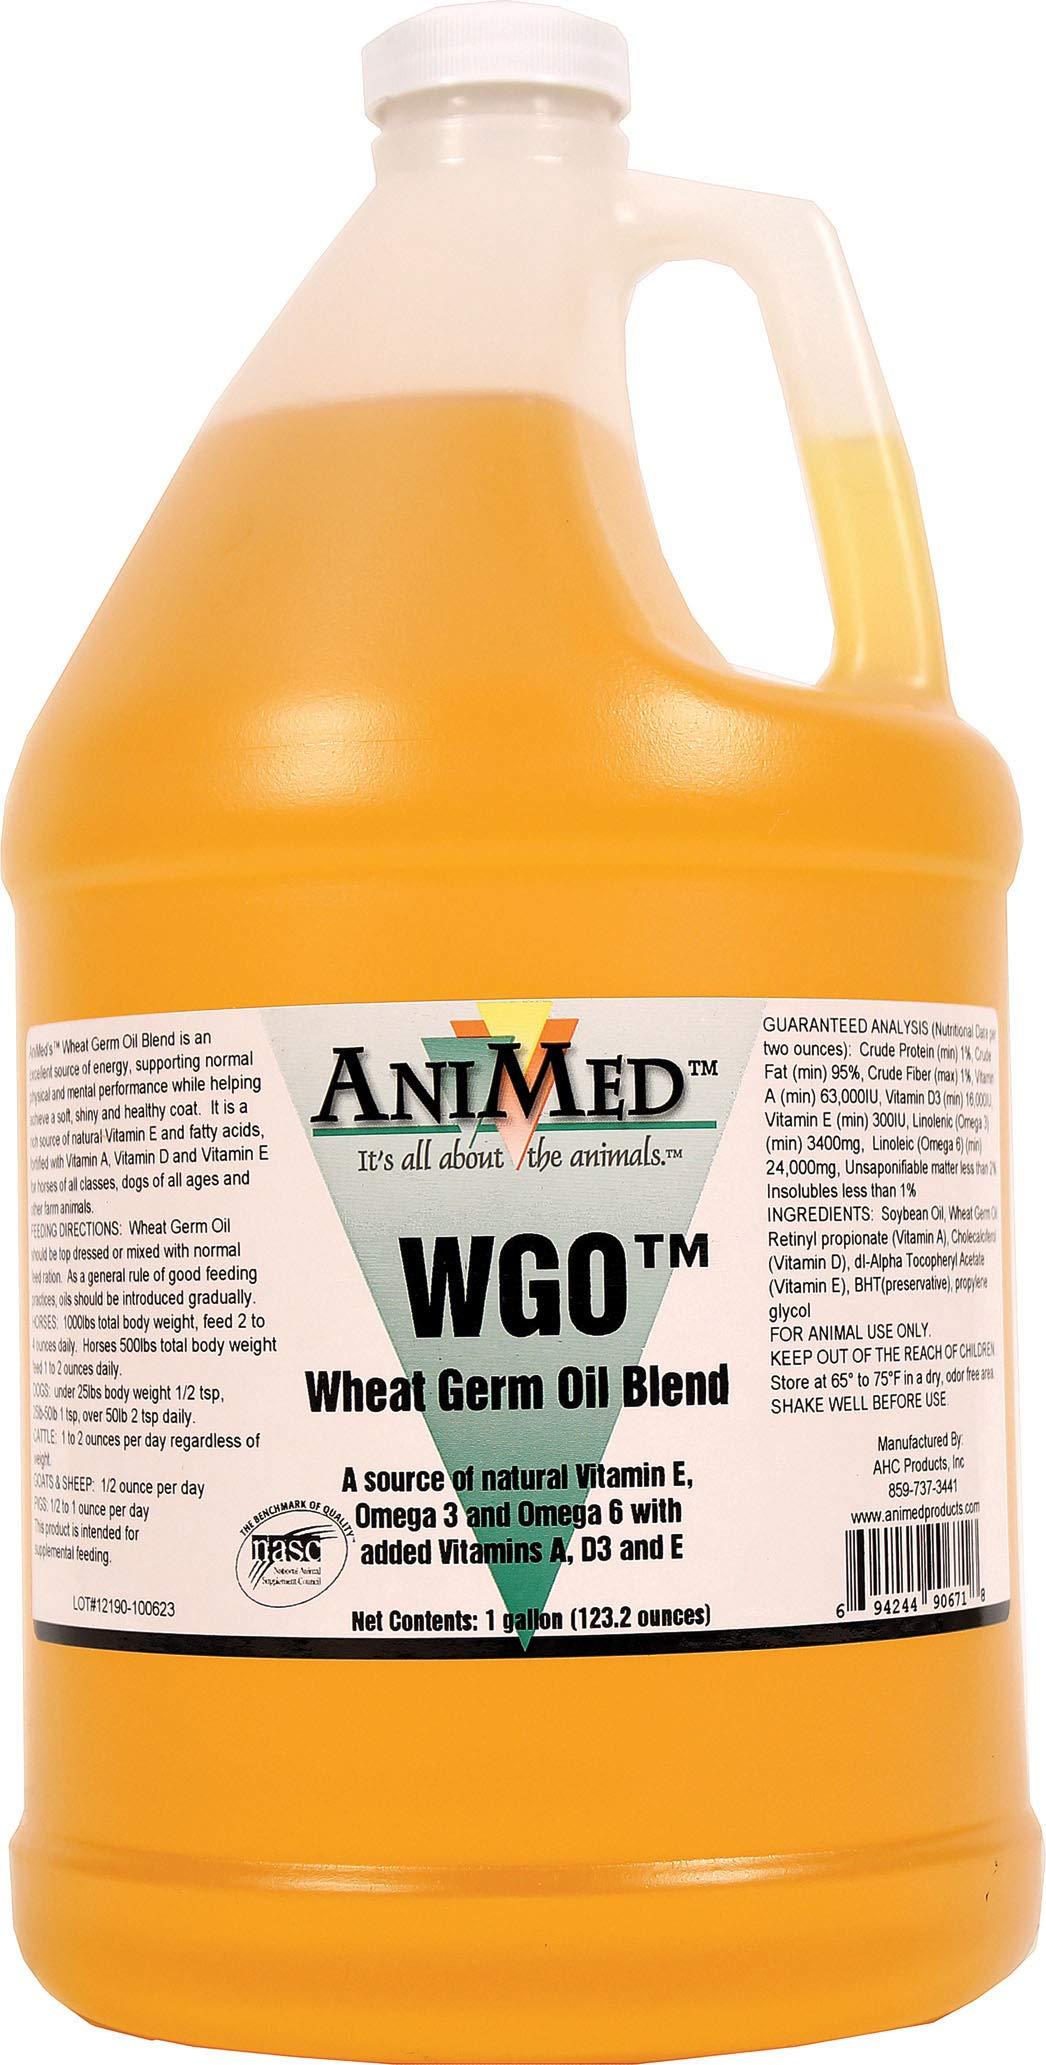 AniMed Wheat Germ Oil Blend by AniMed